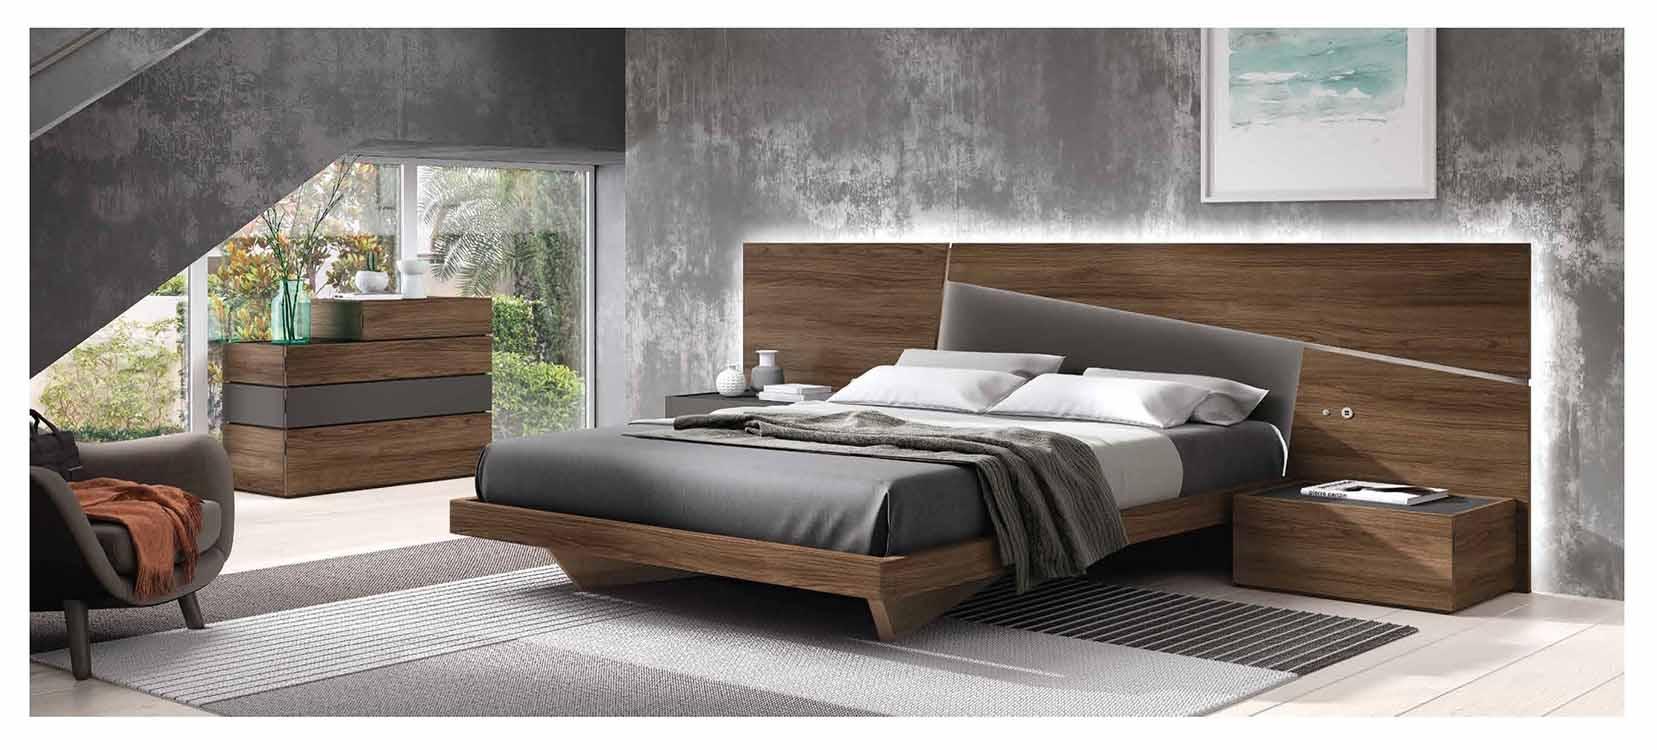 Muebles Muñoz  Modelo Código 0205  Catálogo 1  Dormitorios